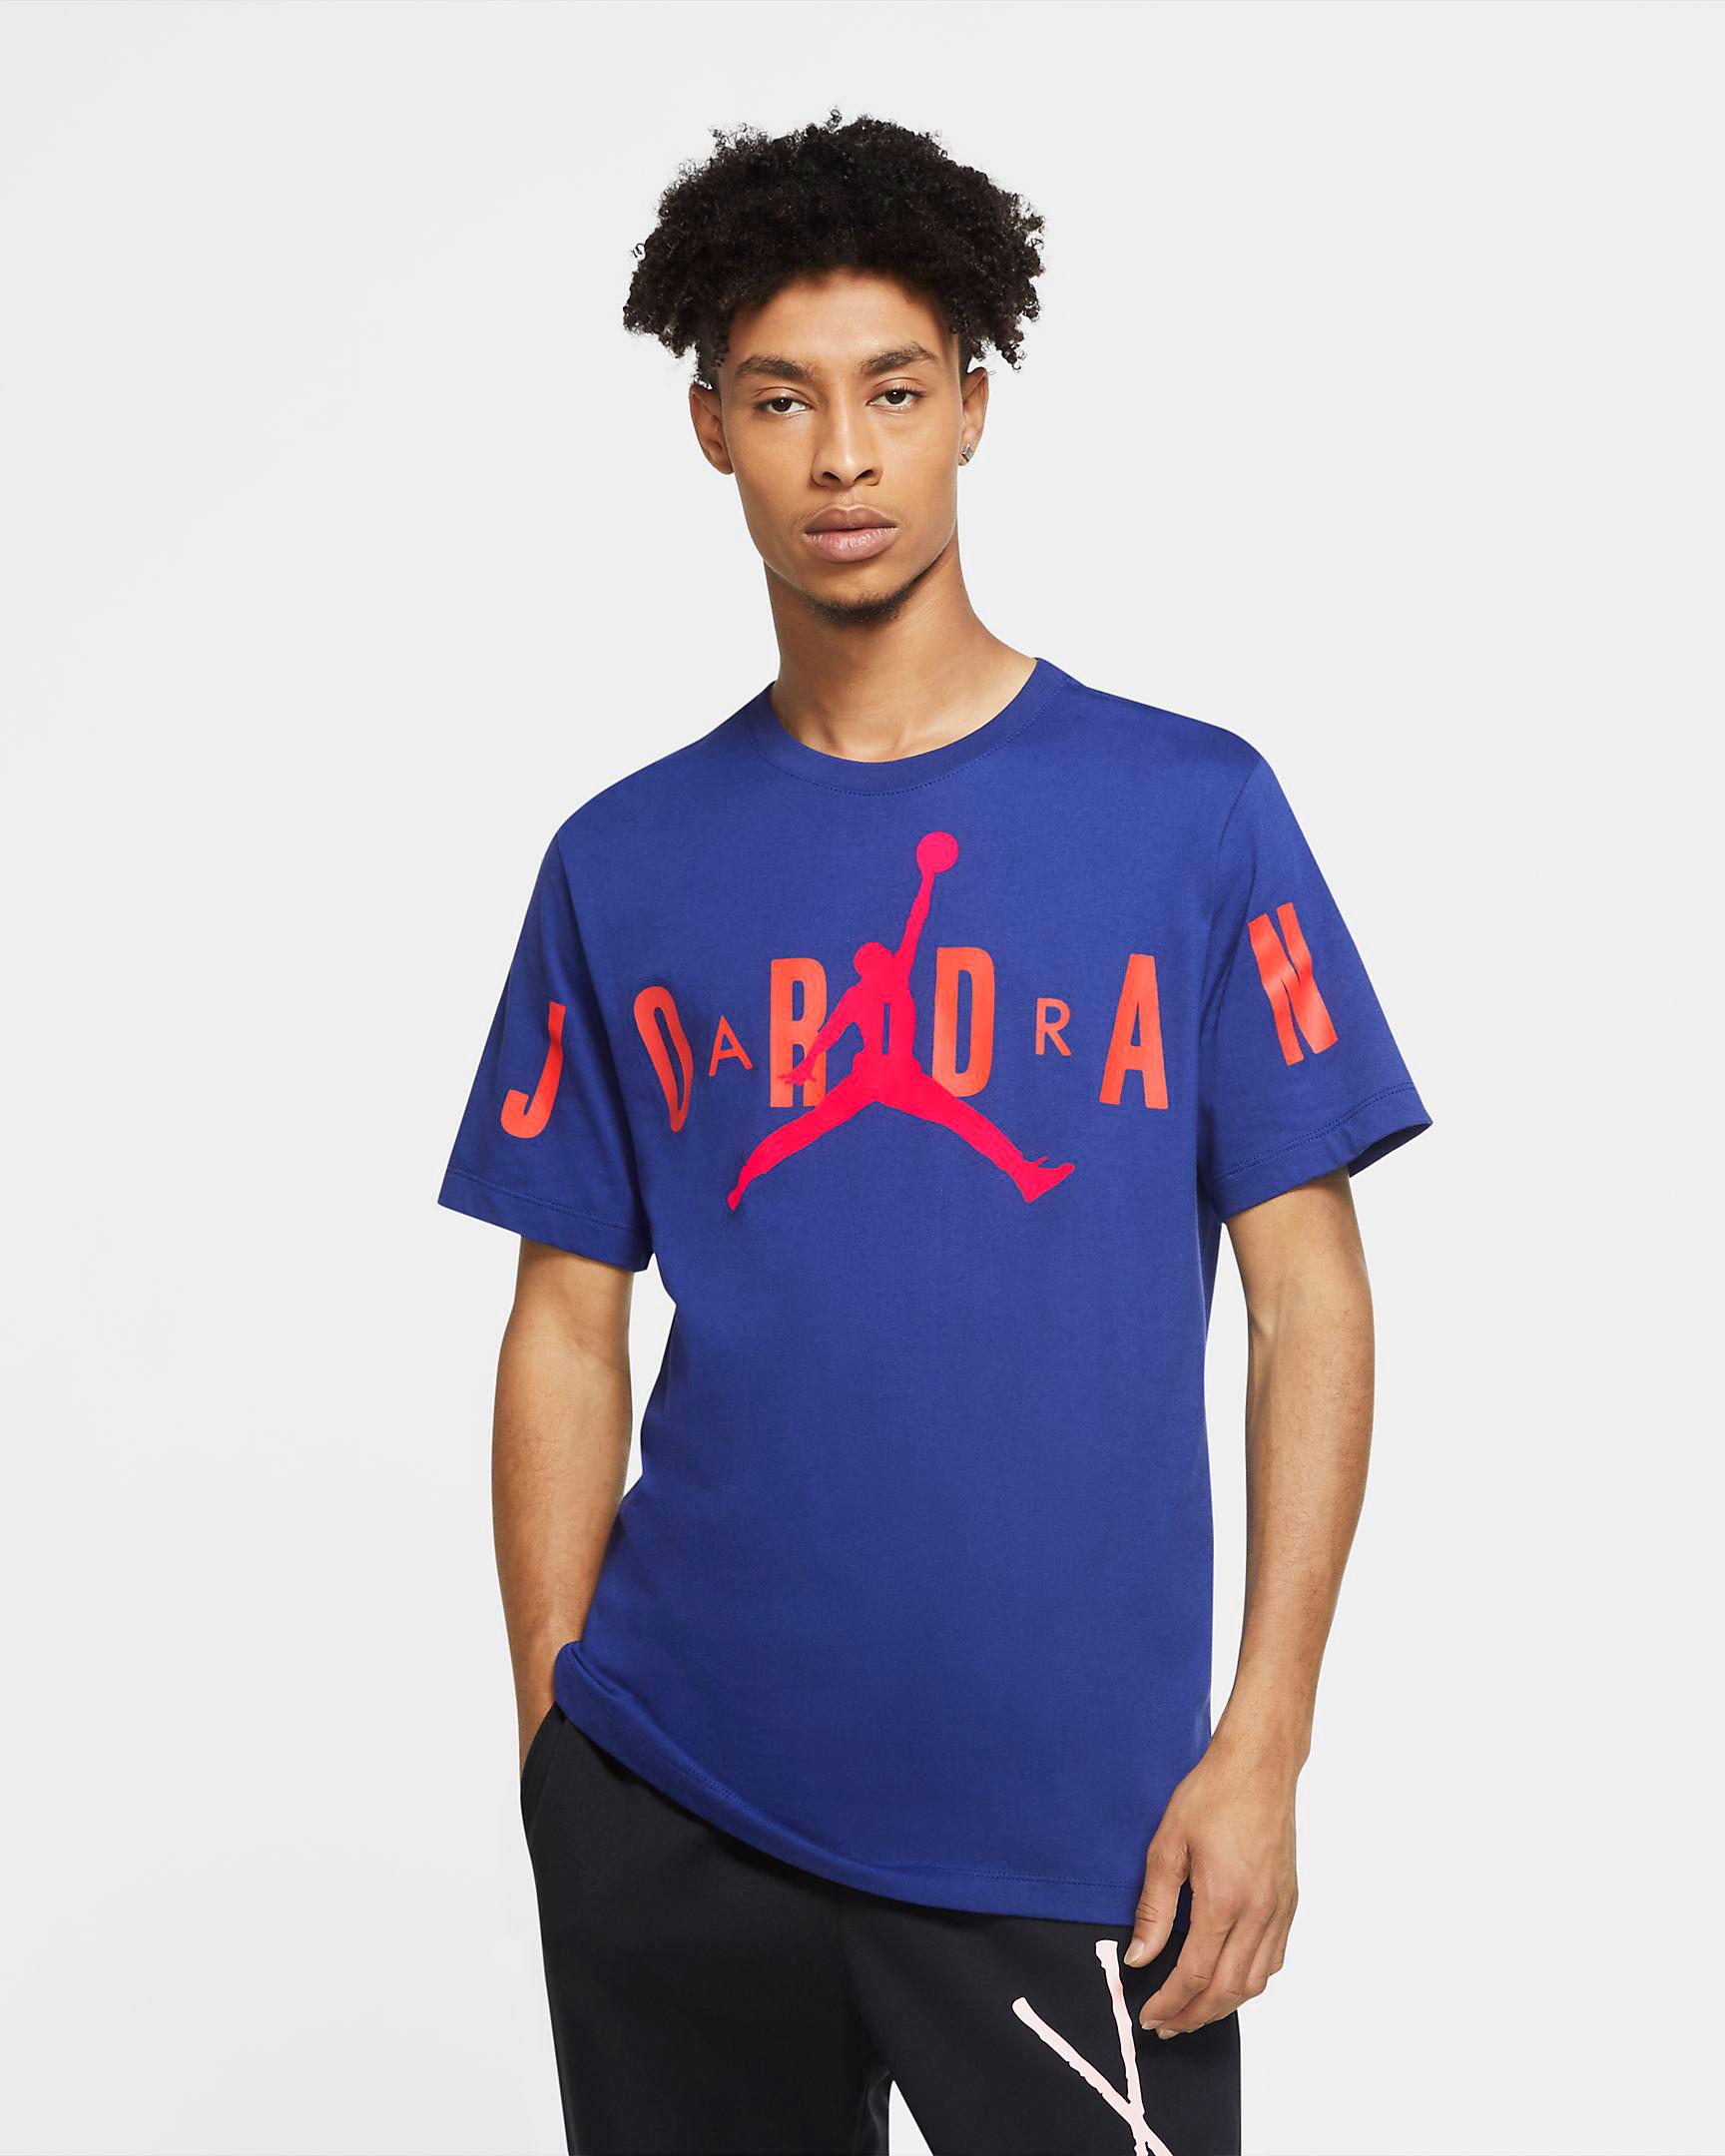 jordan-stretch-t-shirt-blue-infrared